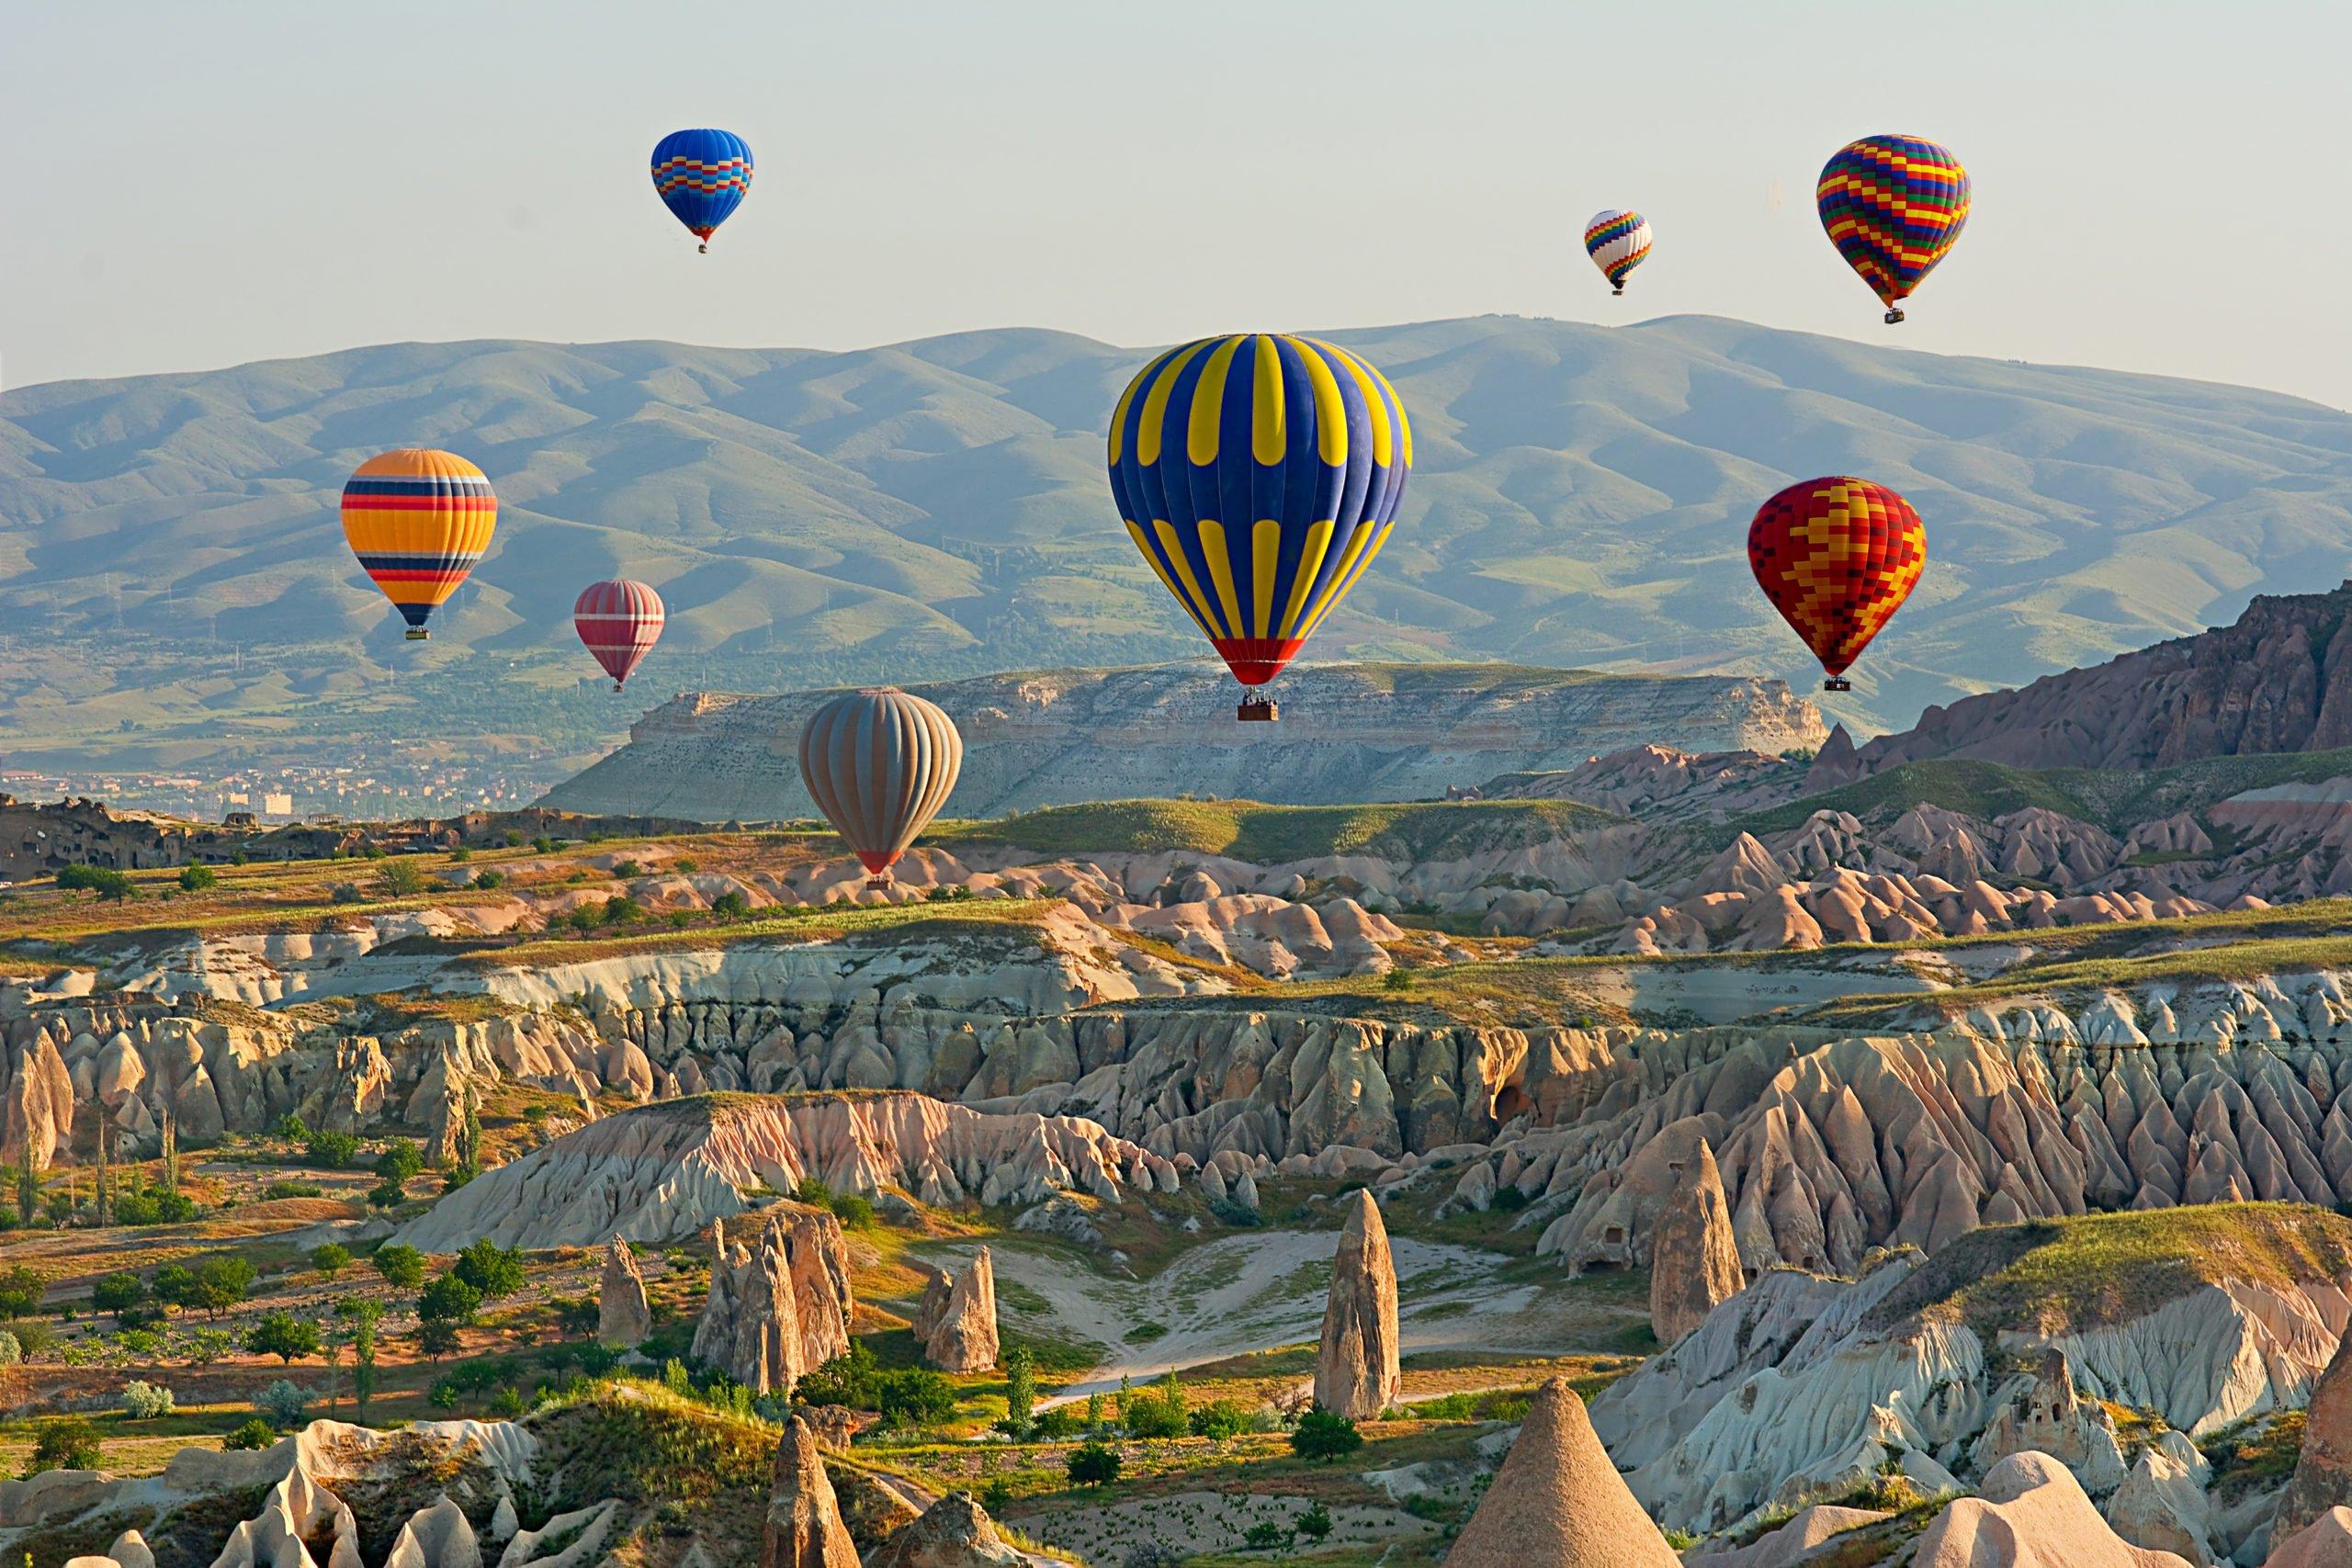 Enjoy The Beautiful Views Over Goremen On The Cappadocia Underground City Tour From Goreme